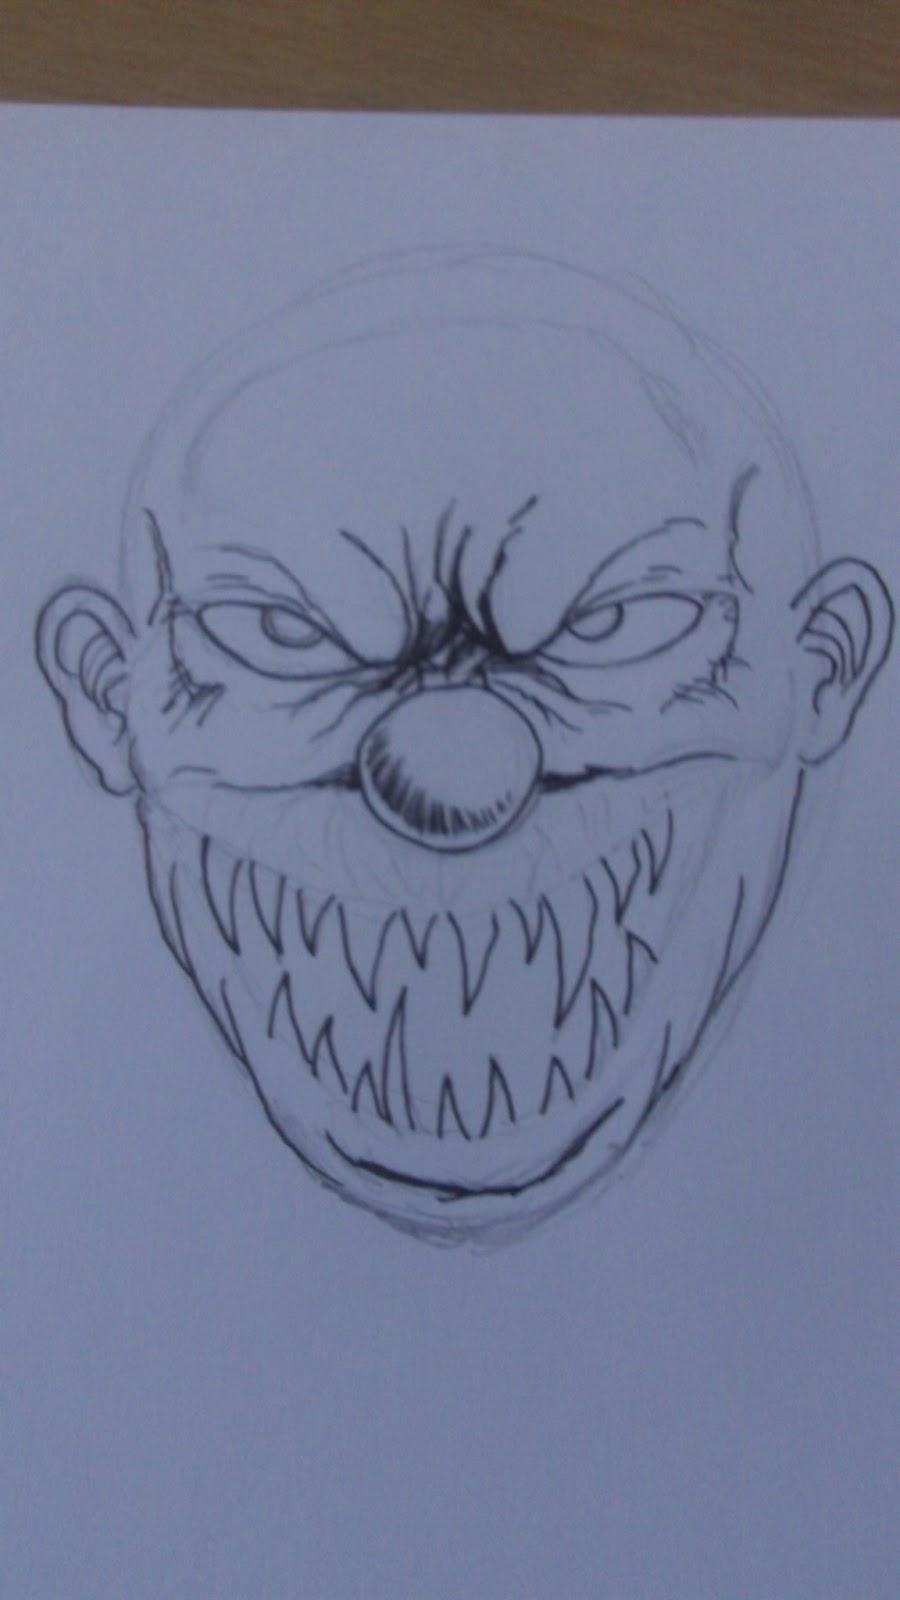 Wayne Tully Fantasy Art: How To Draw A Demon Clown Face